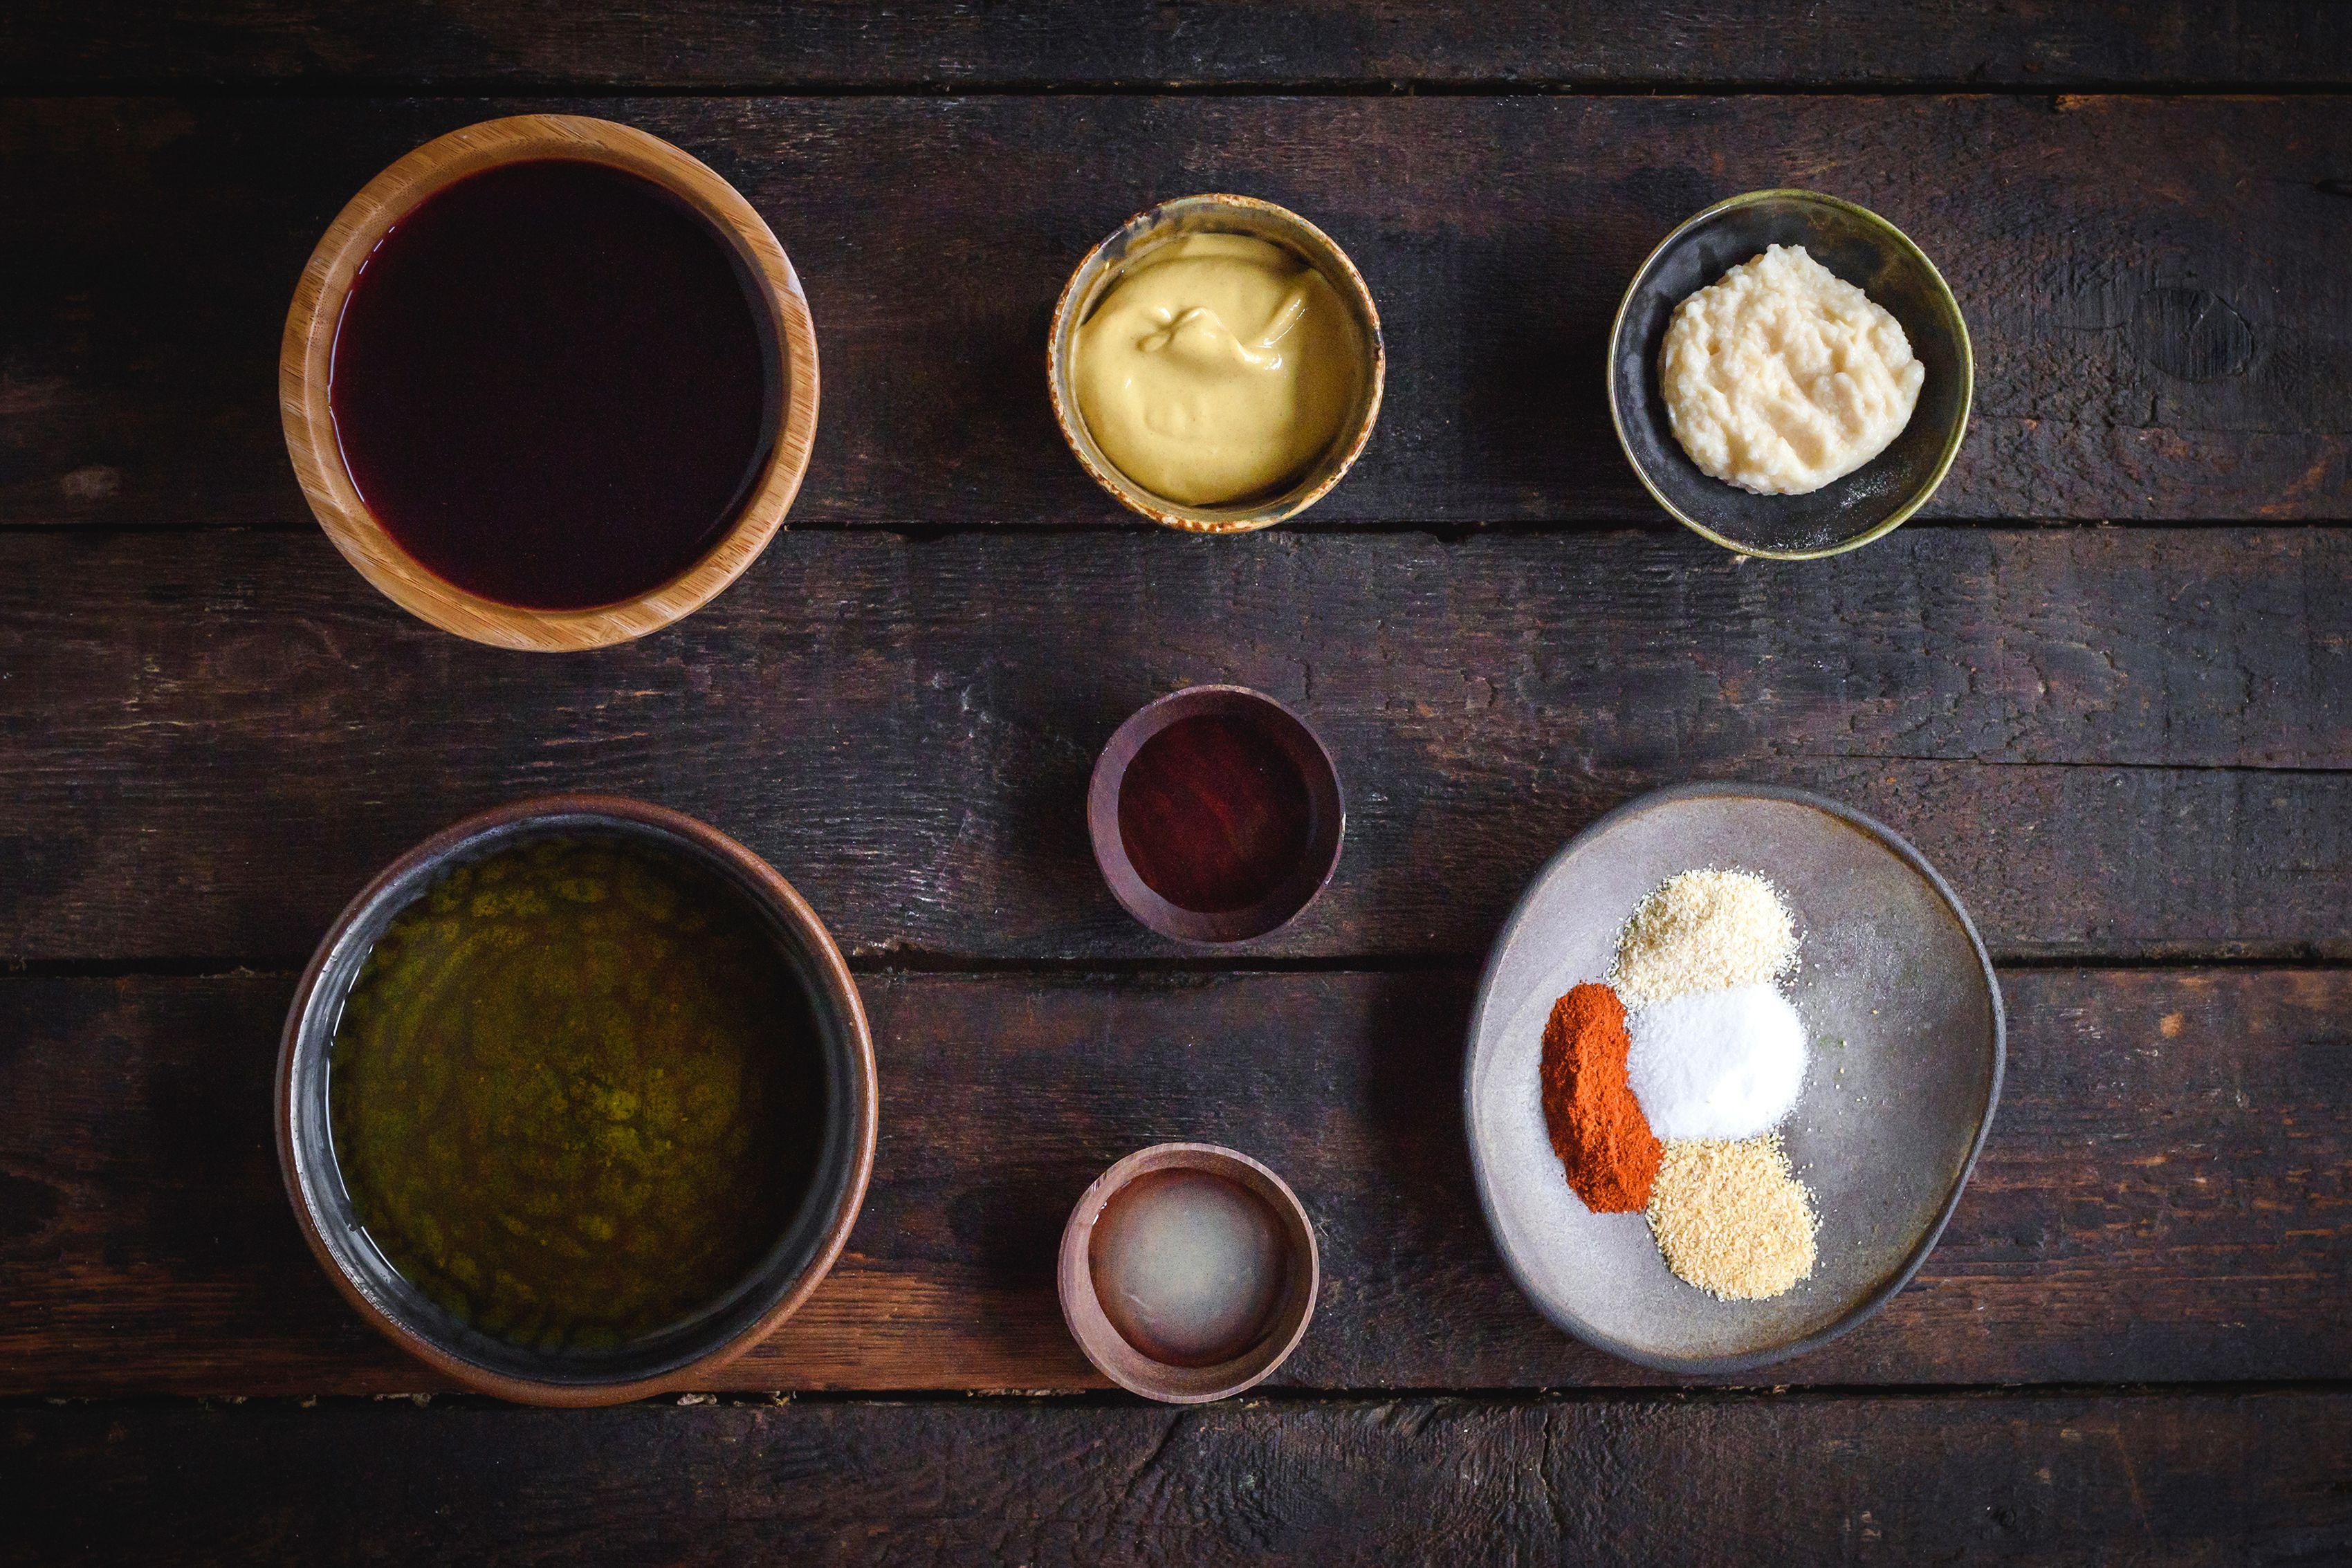 Ingredients for brisket marinade